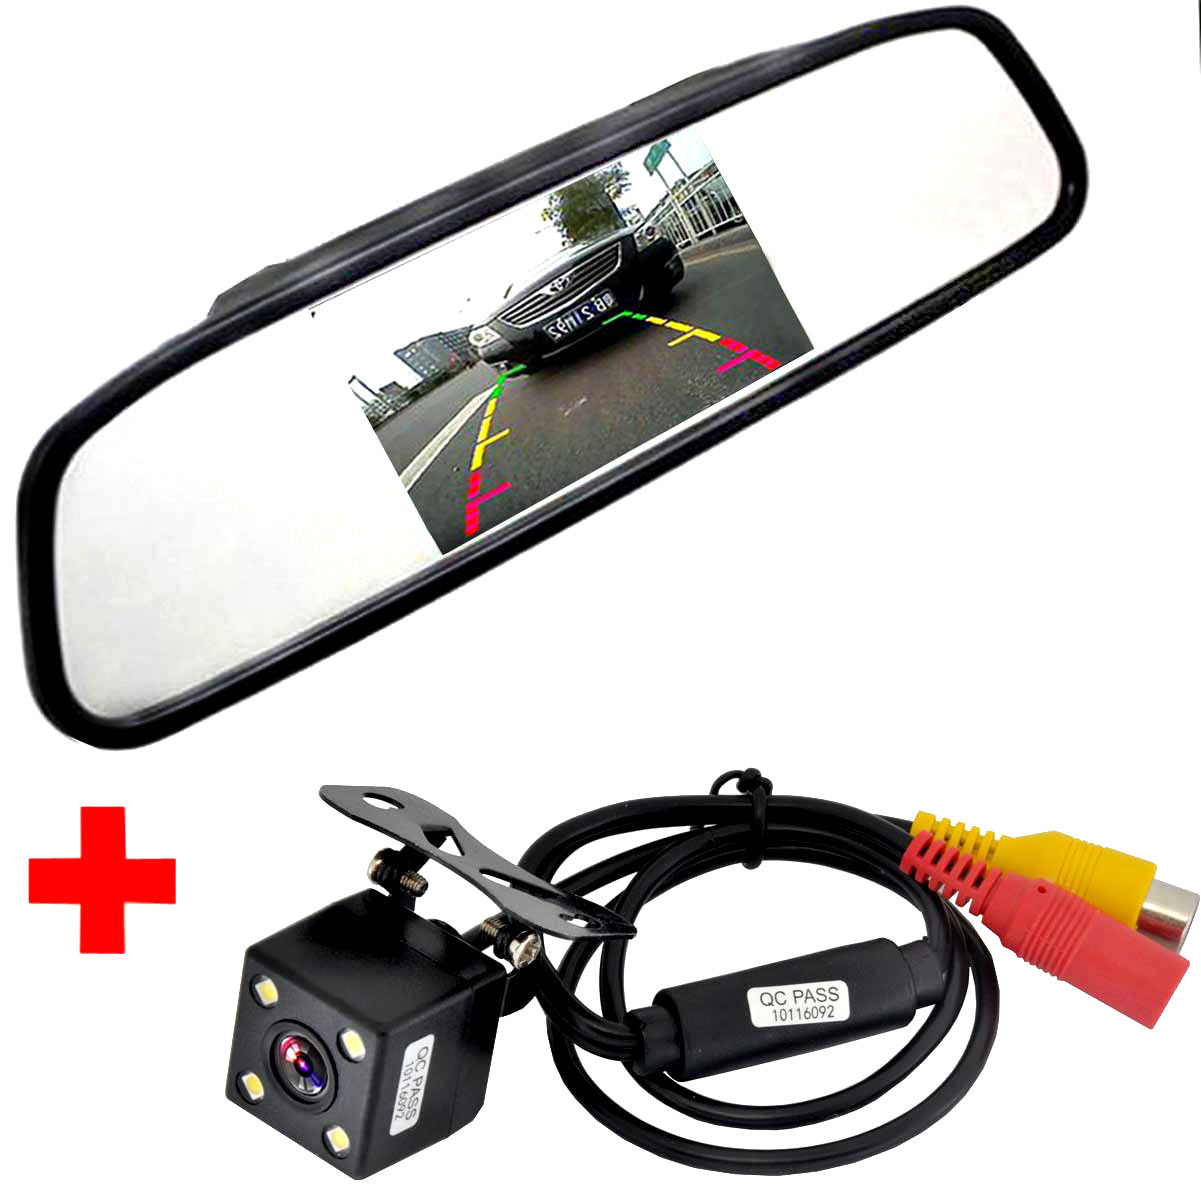 Mobil HD Video Parkir Mobil Monitor, malam LED Vision Reversing CCD Kamera Belakang Mobil dengan 4.3 Inci Mobil Spion Monitor